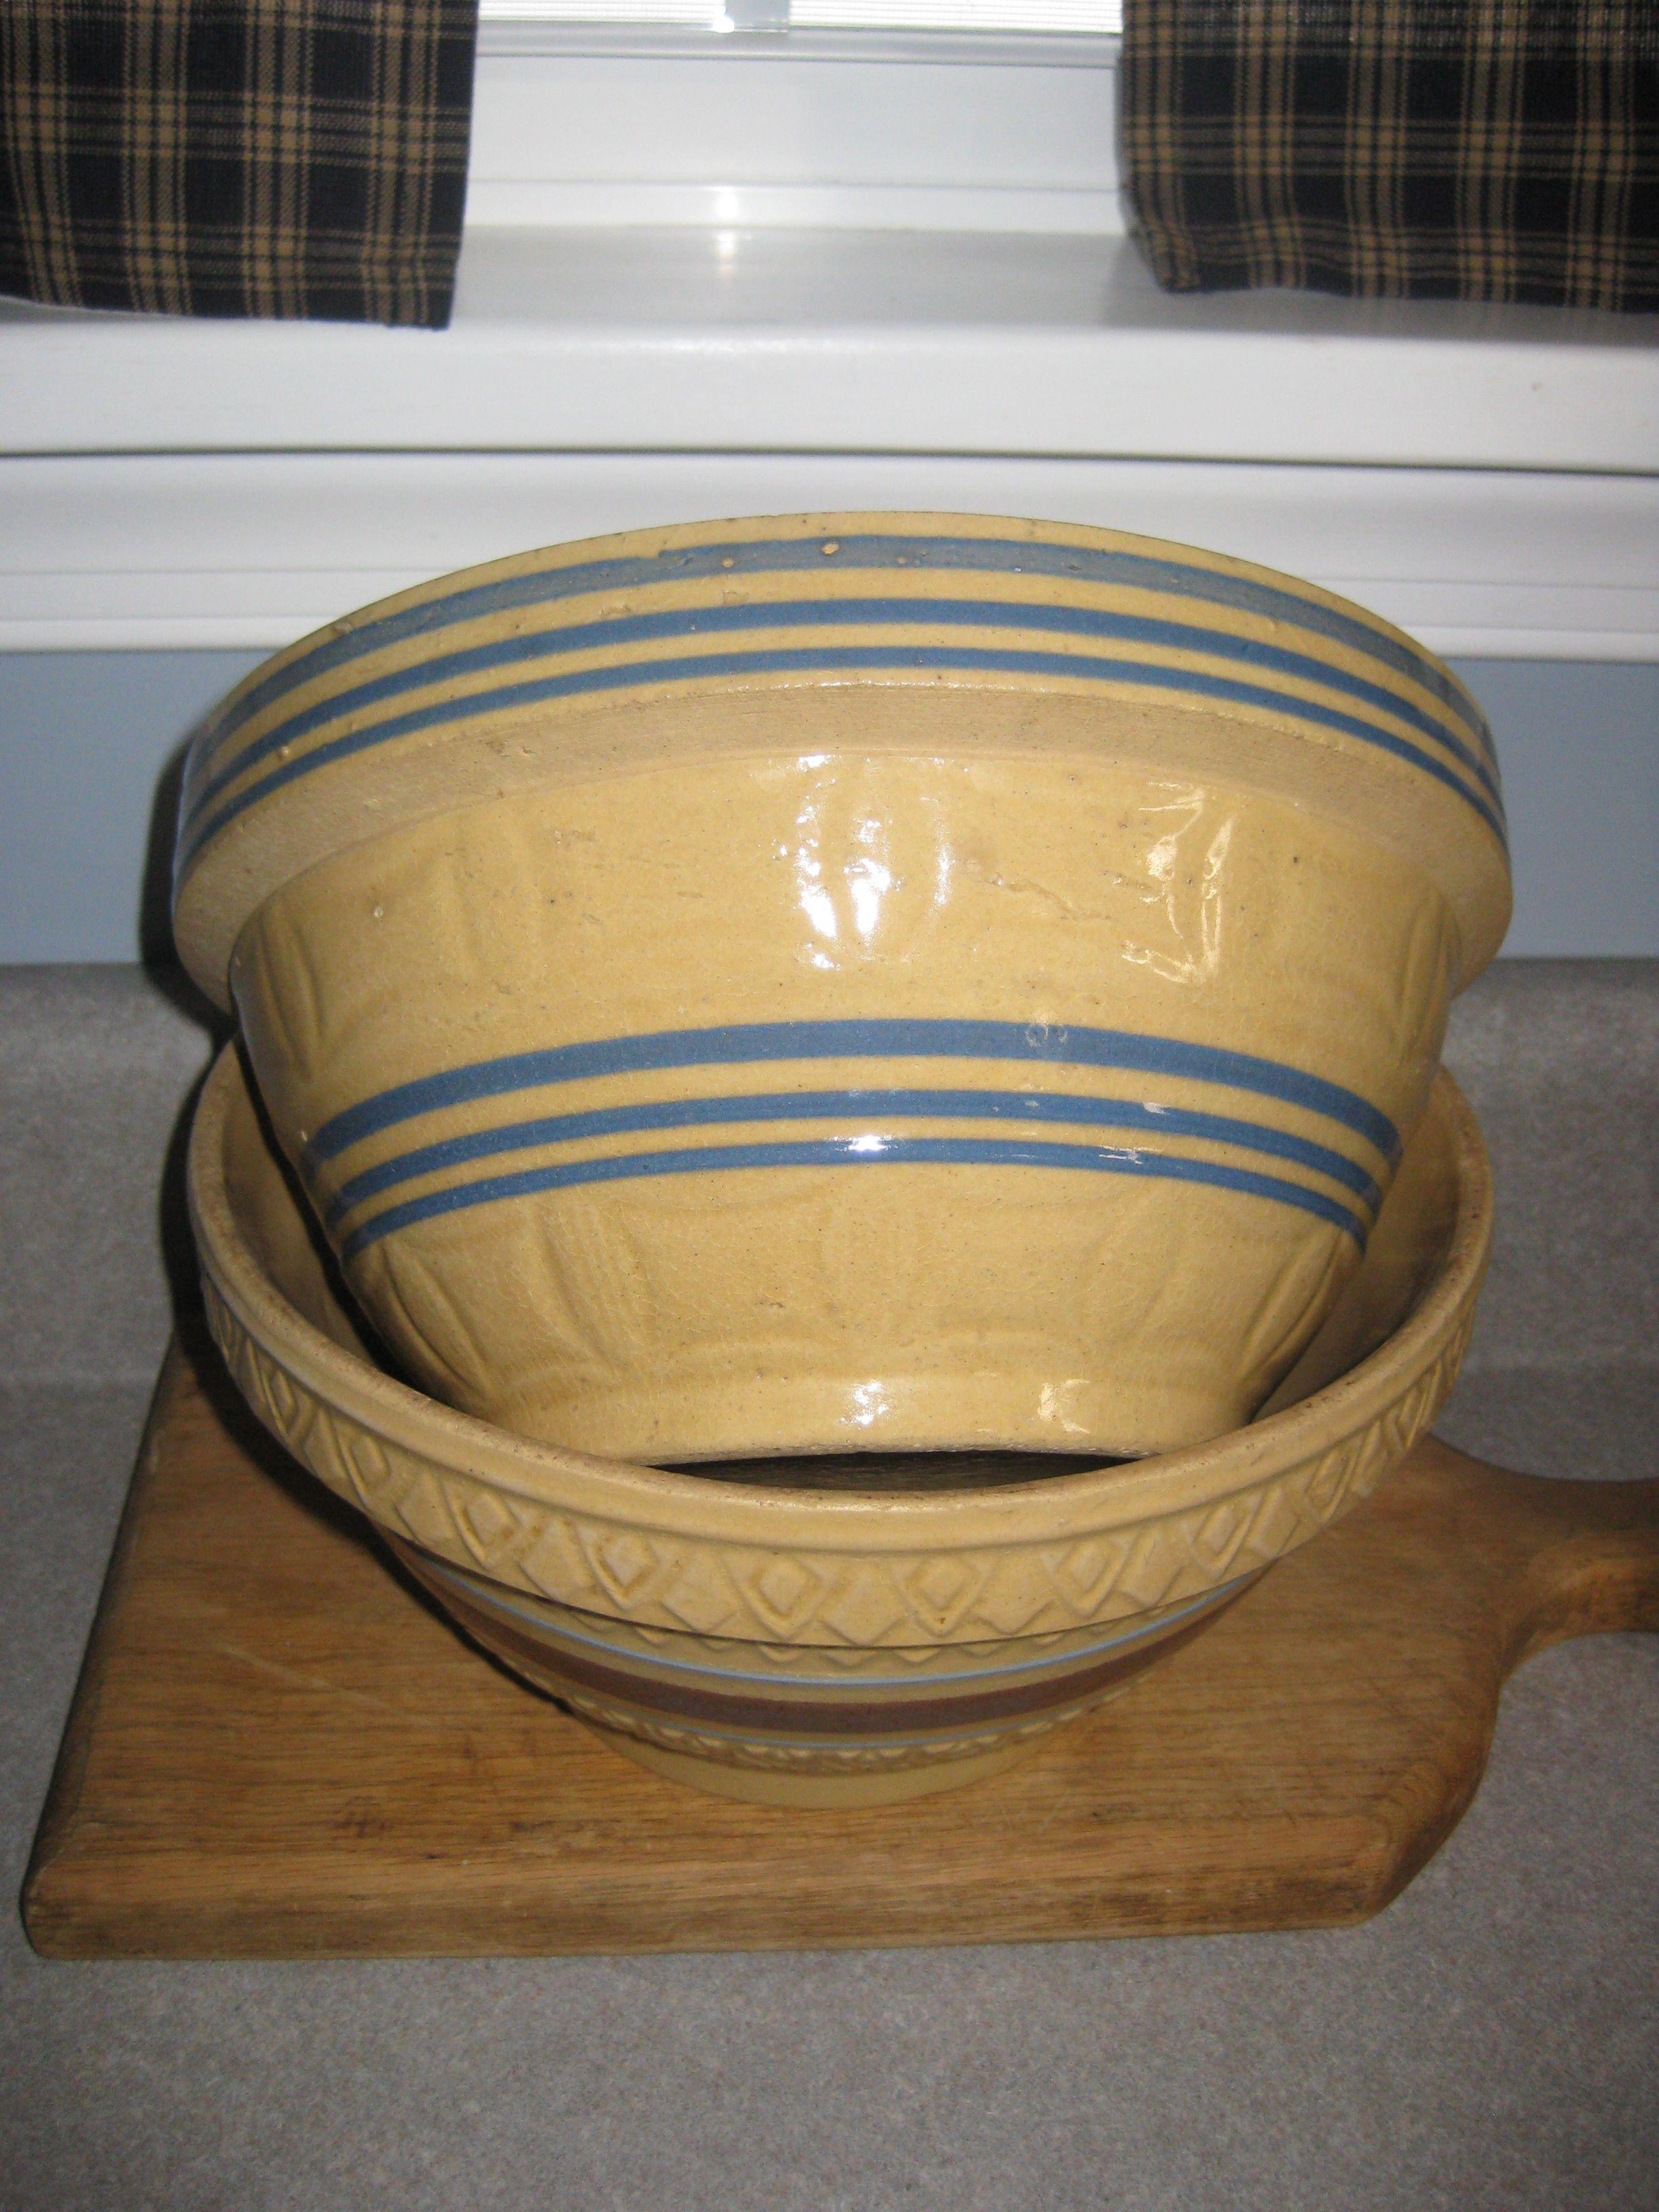 Antique Yellow Ware Bowls | Kitchen Stuff | Pinterest ...